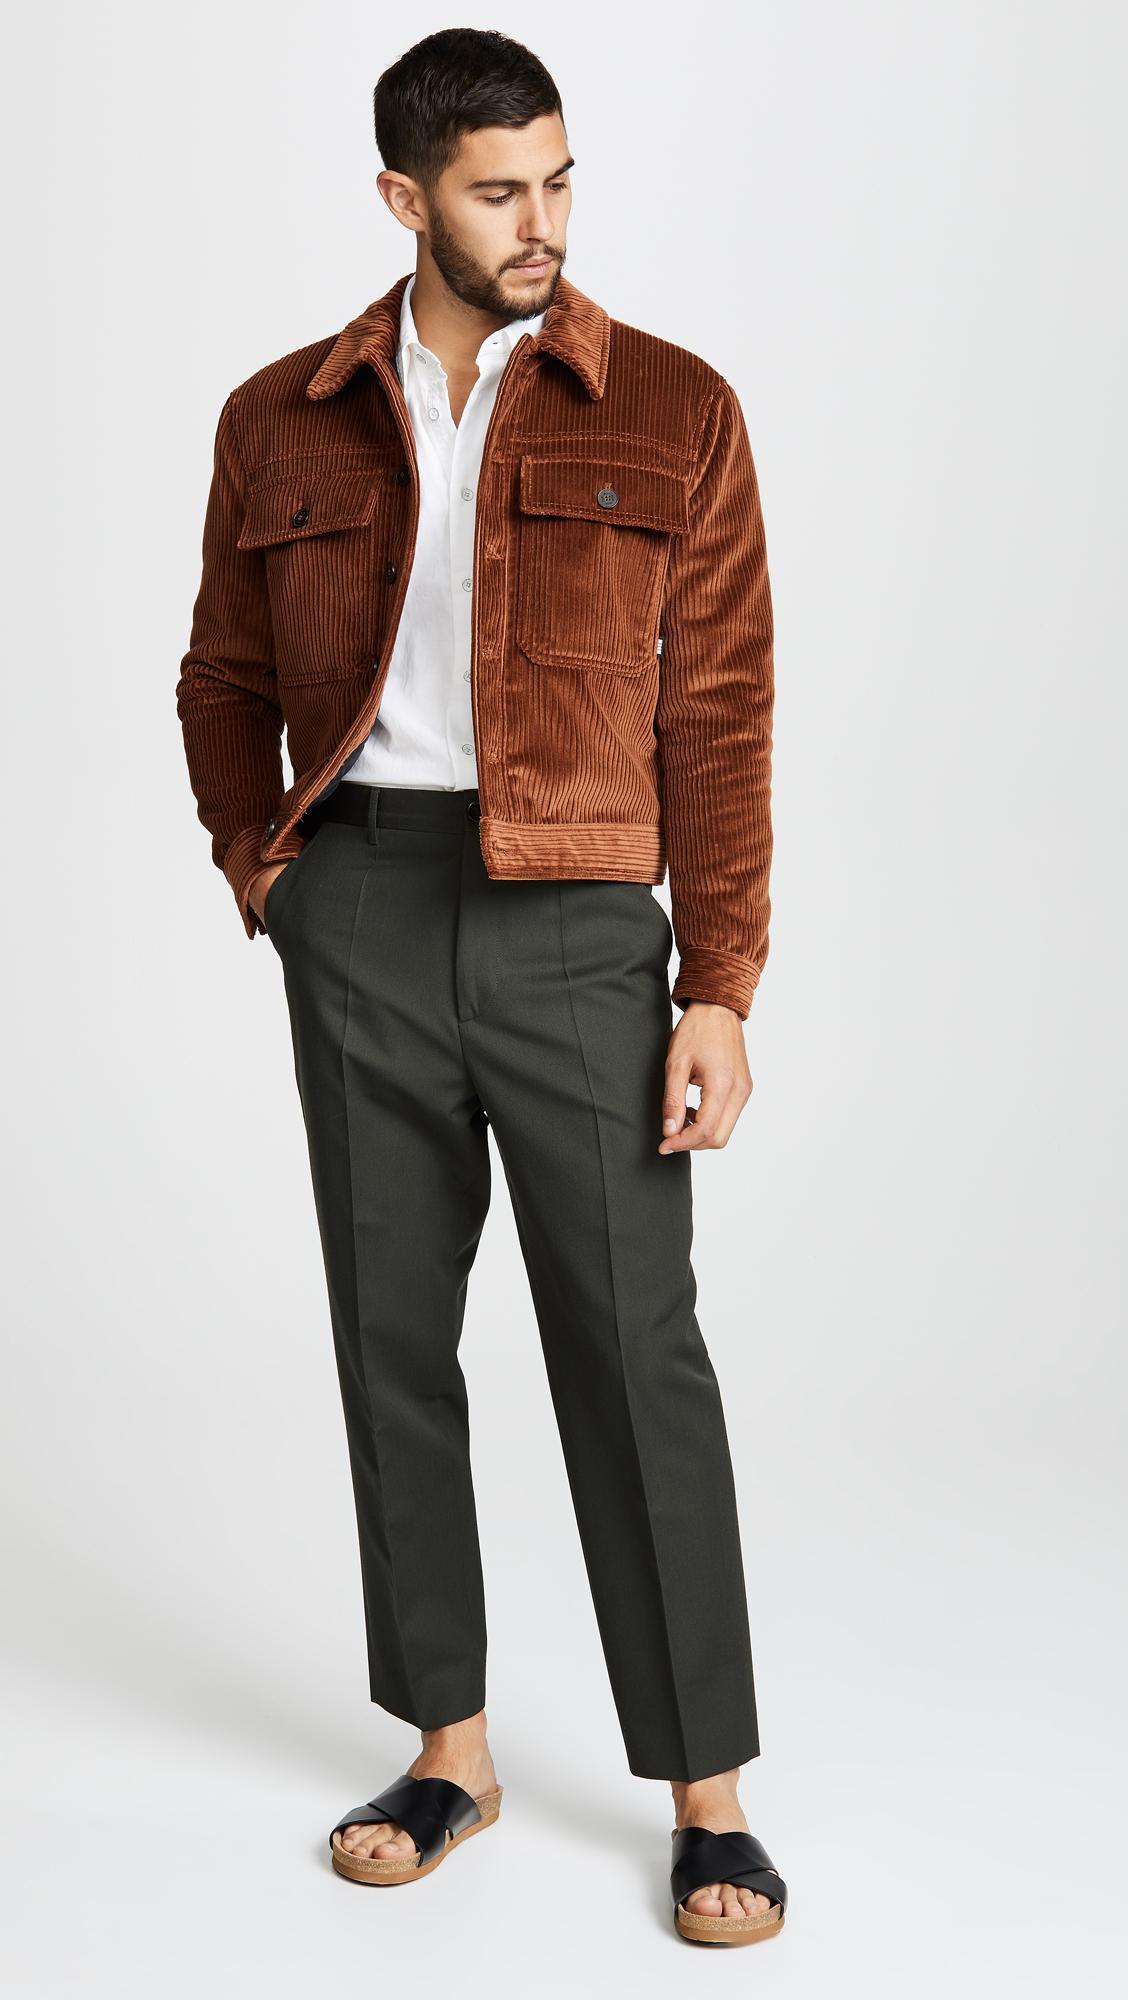 0ffbeb43dce3 MSGM Corduroy Velvet Jacket in Brown for Men - Lyst